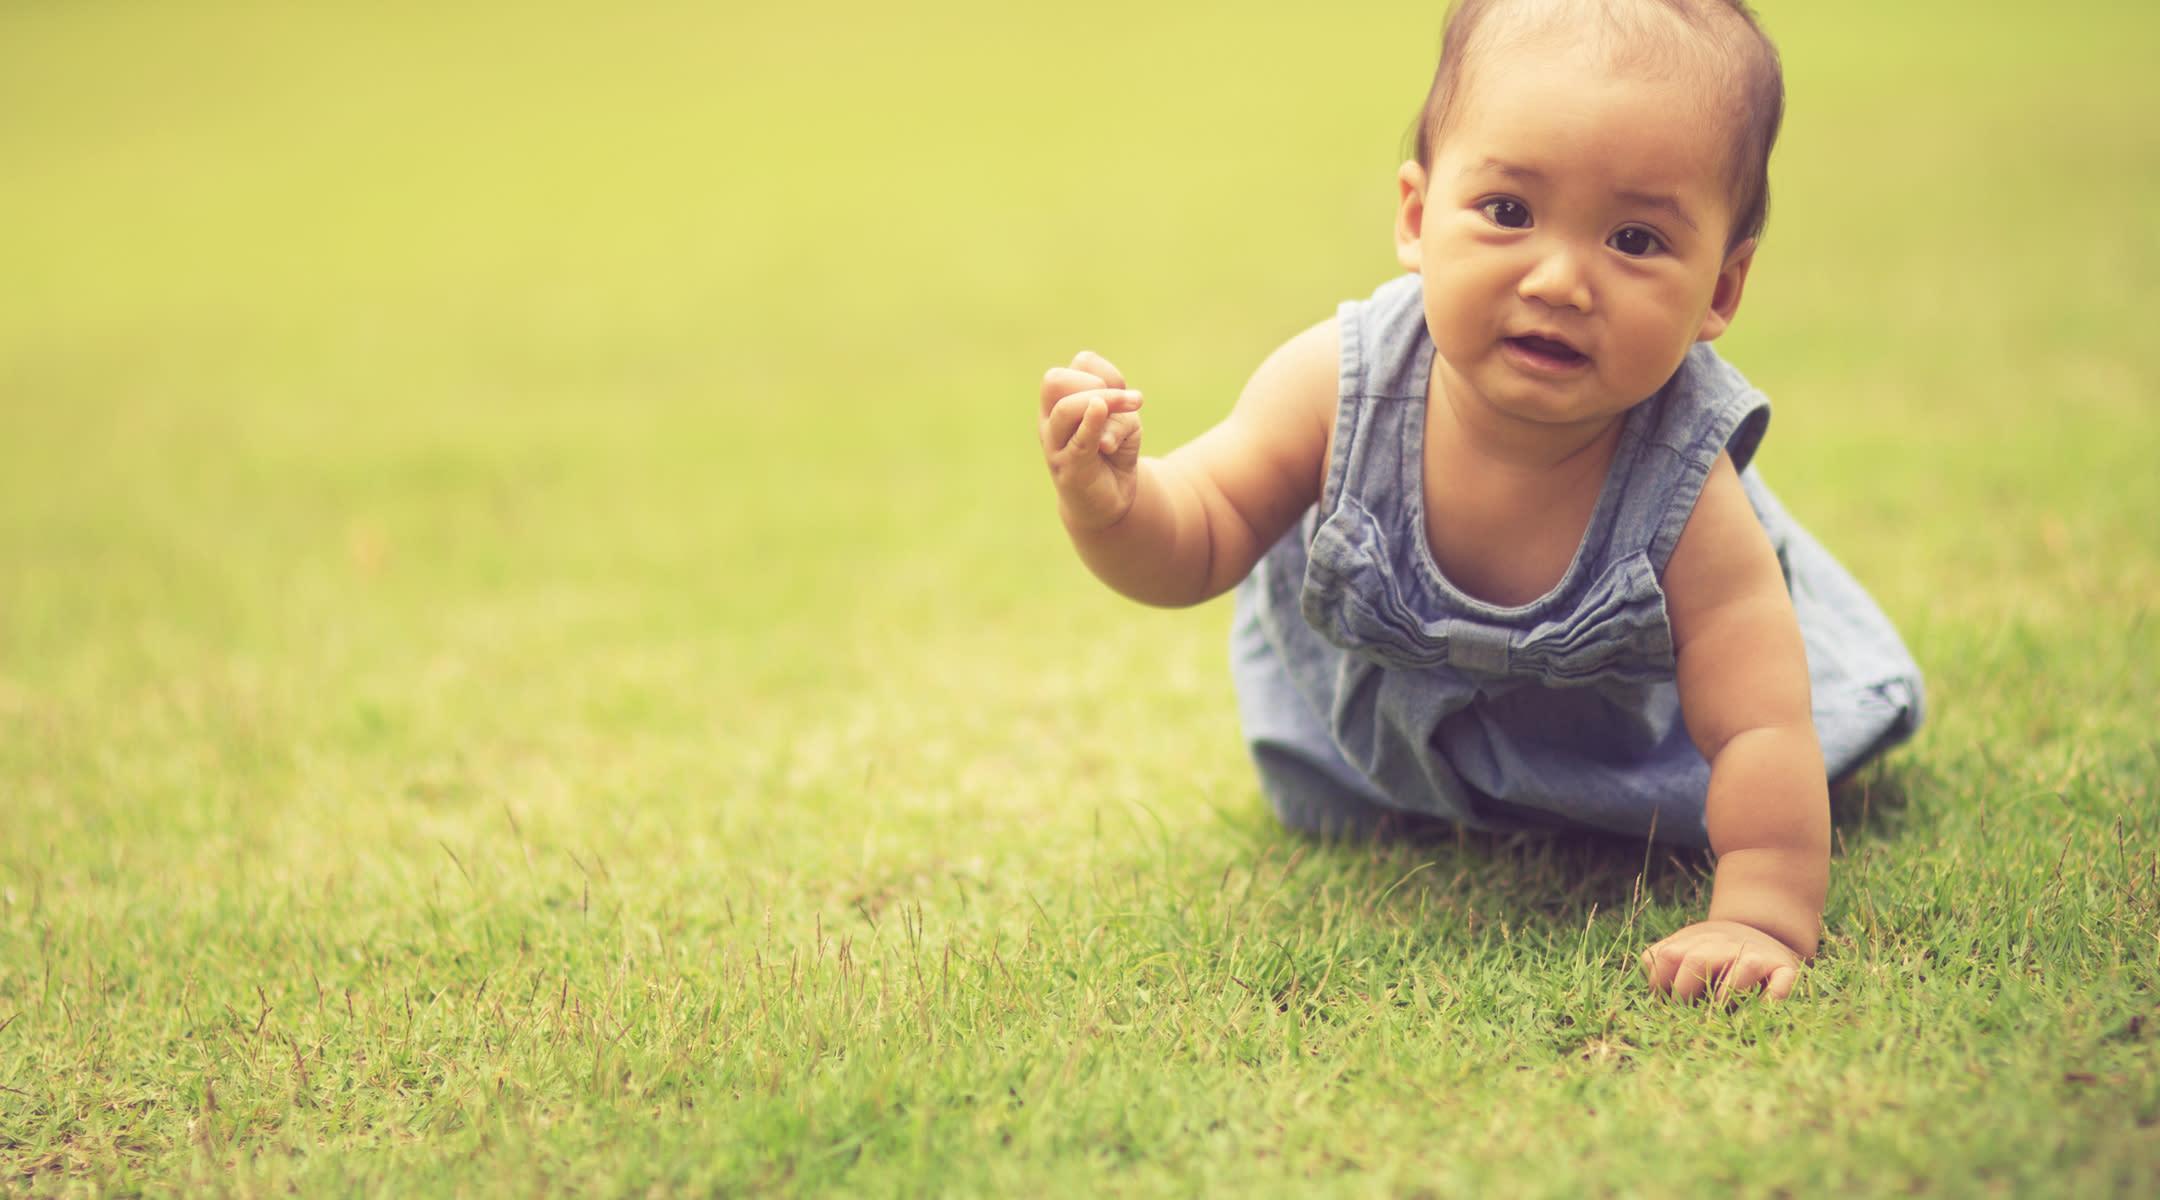 crawl - photo #3